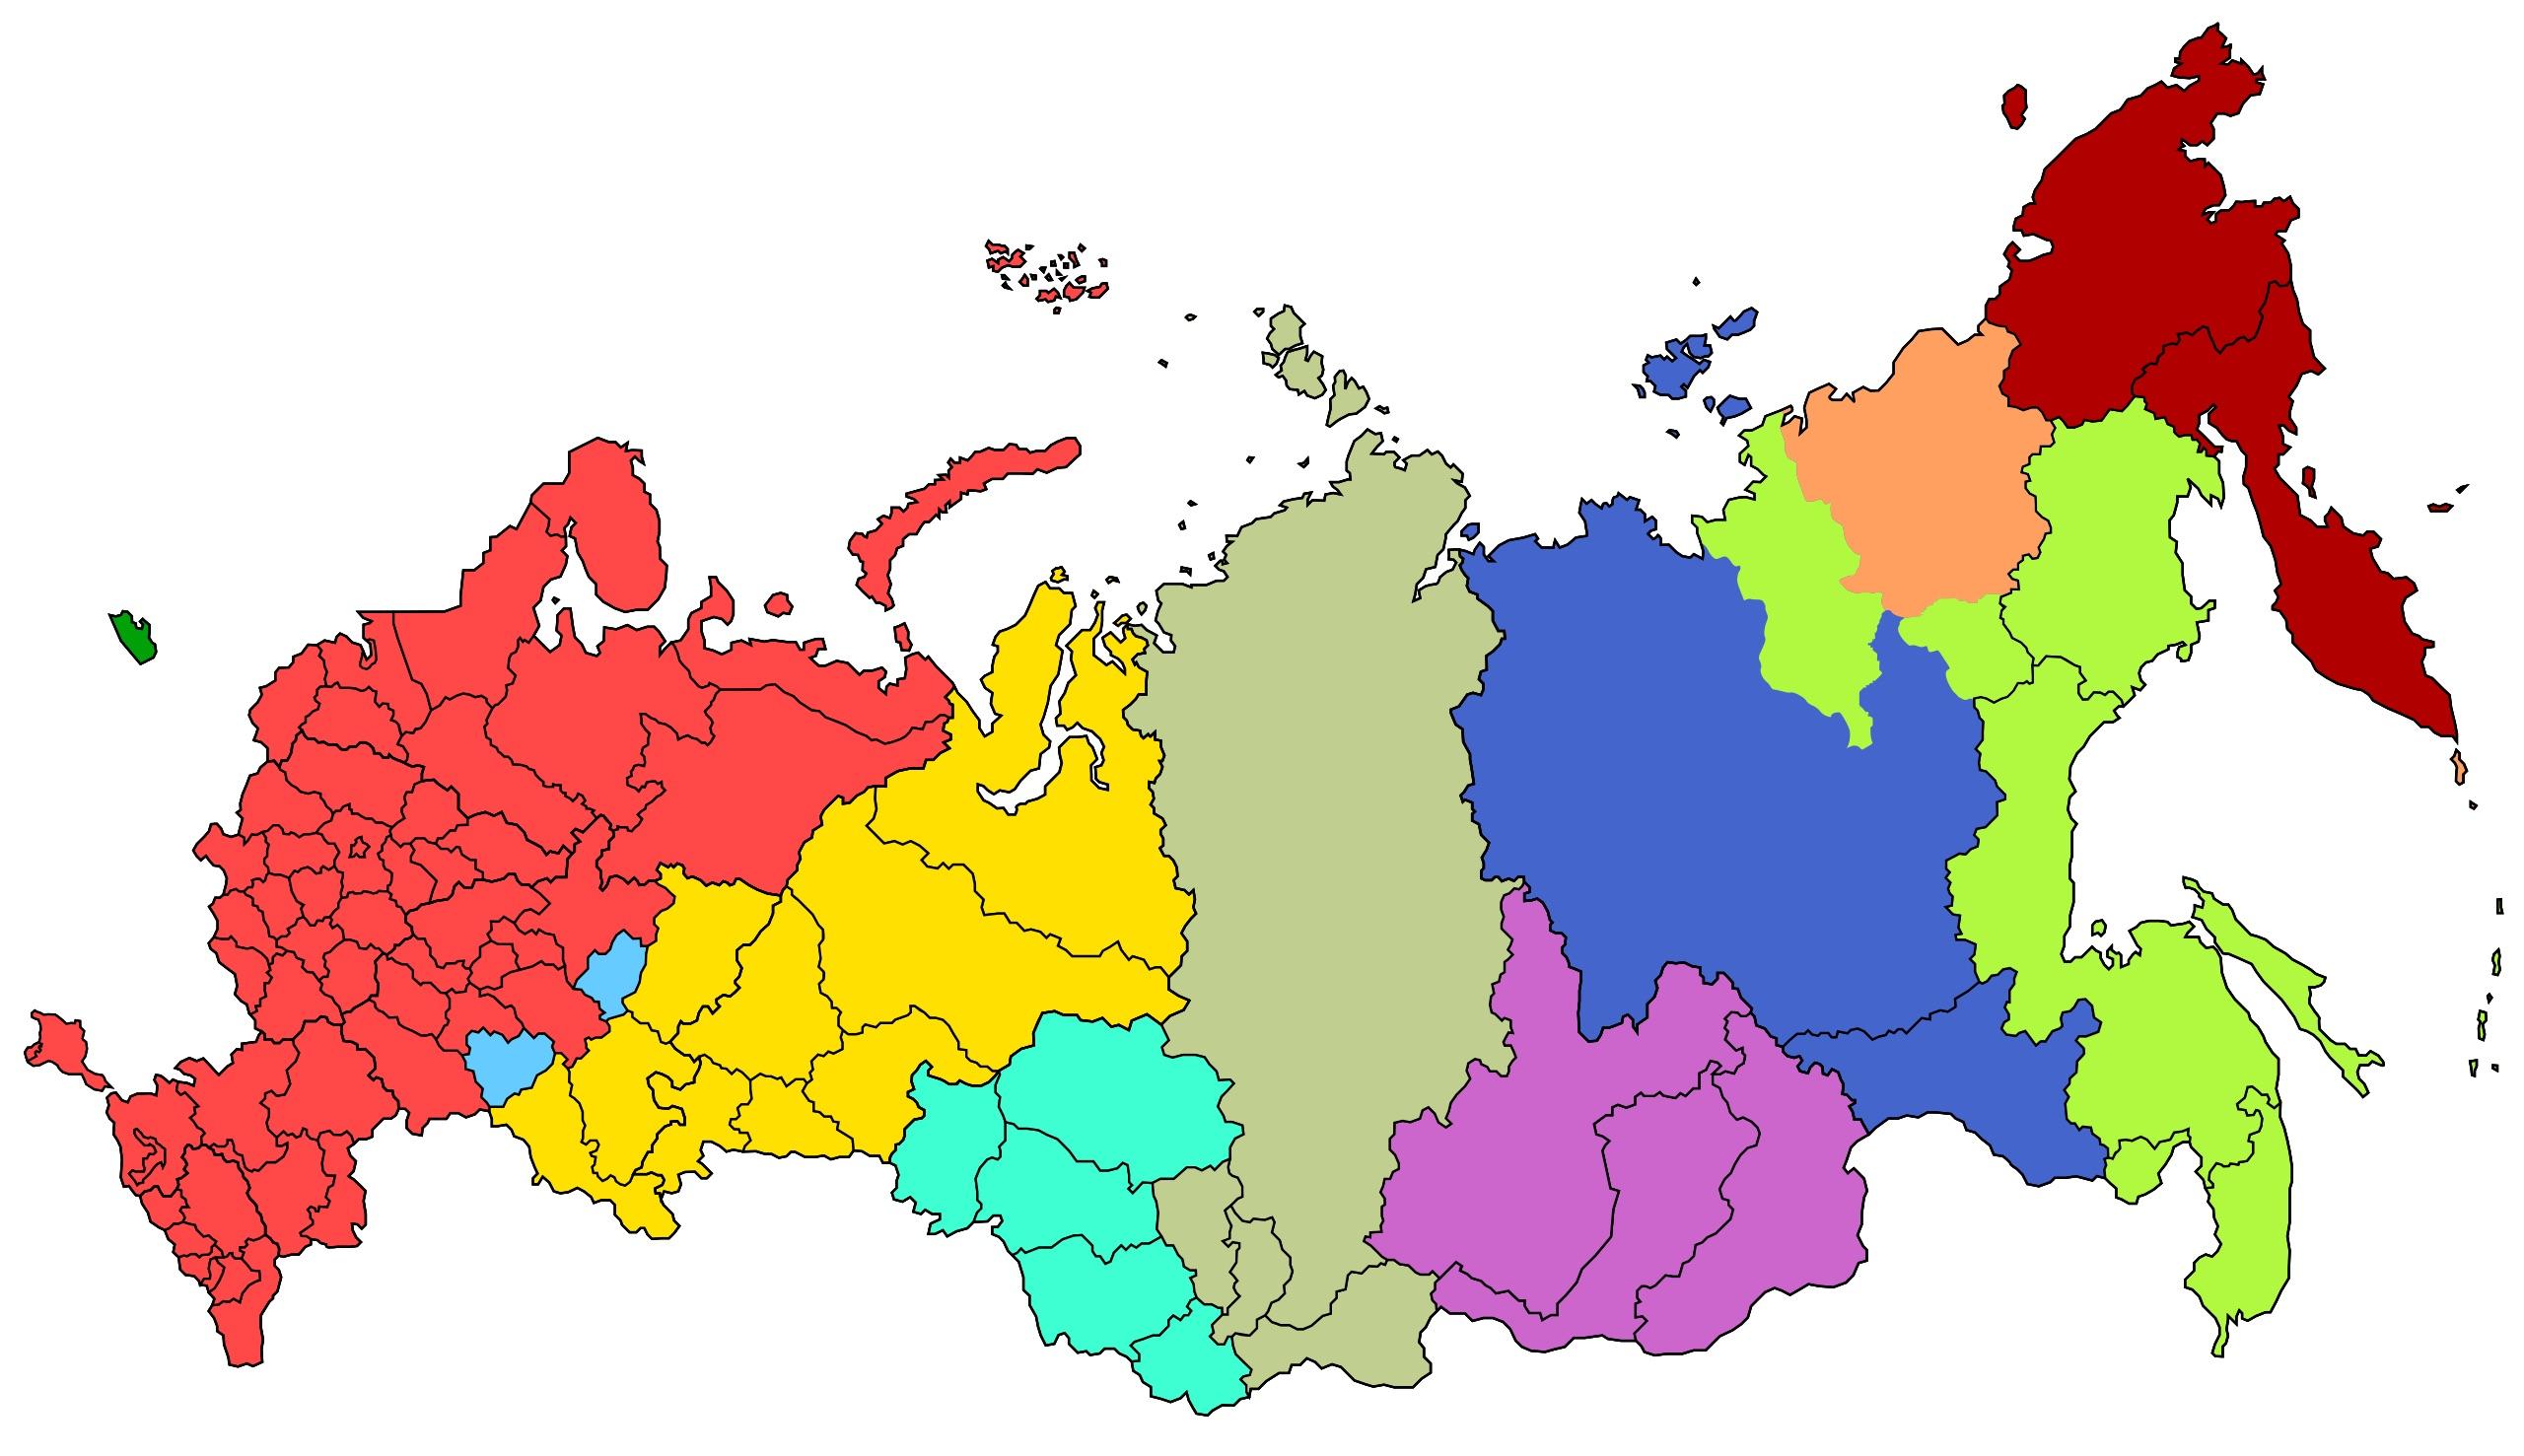 O Segredo E Que Para Os Moradores De Moscou A Russia E Apenas A Cidade De Moscou Entretanto Para Os Moradores De Outras Cidades A Russia Nao Se